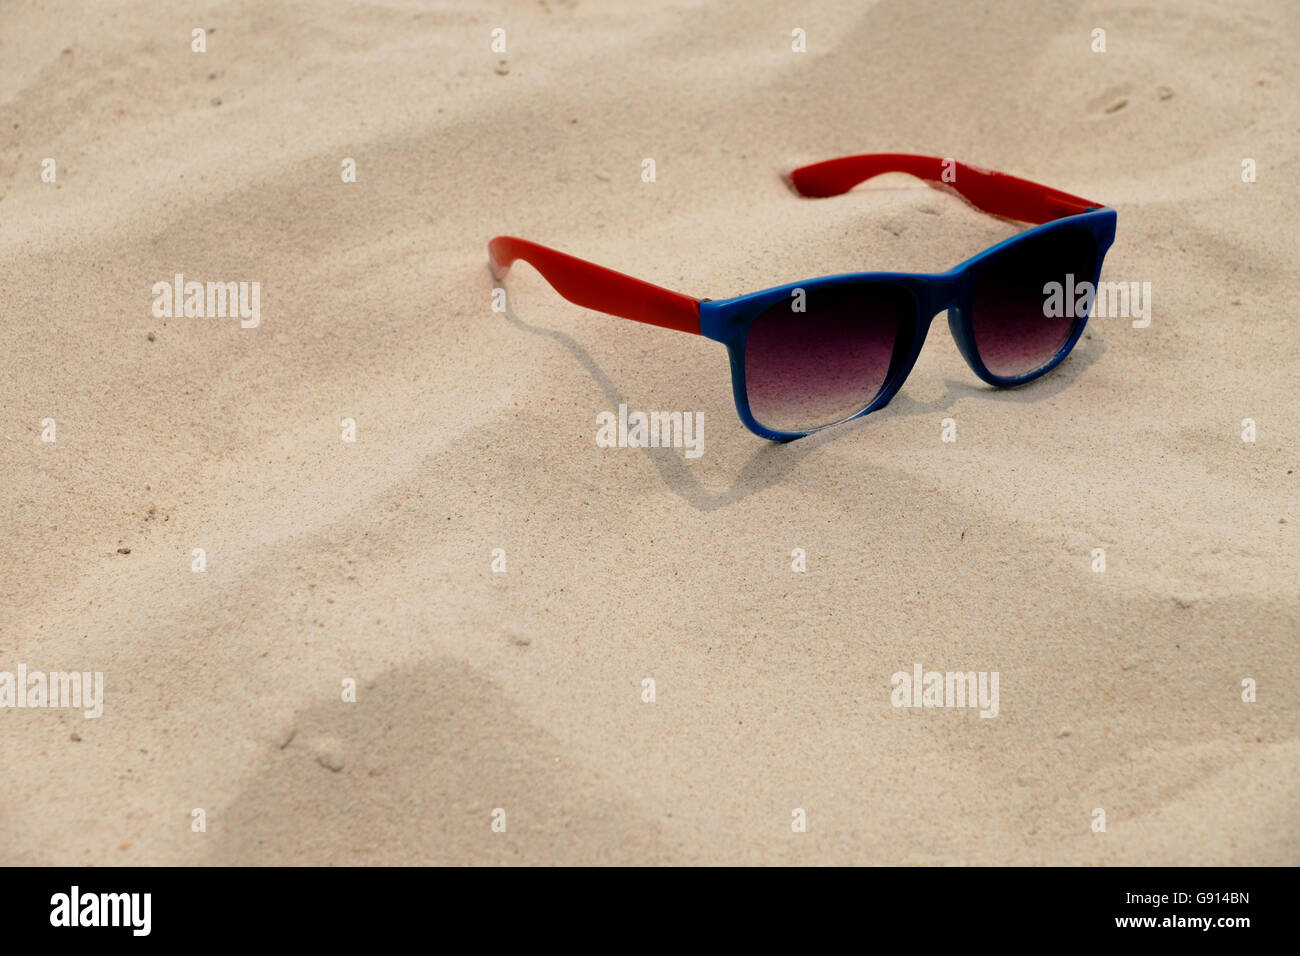 Sunglass on the Sand - Stock Image